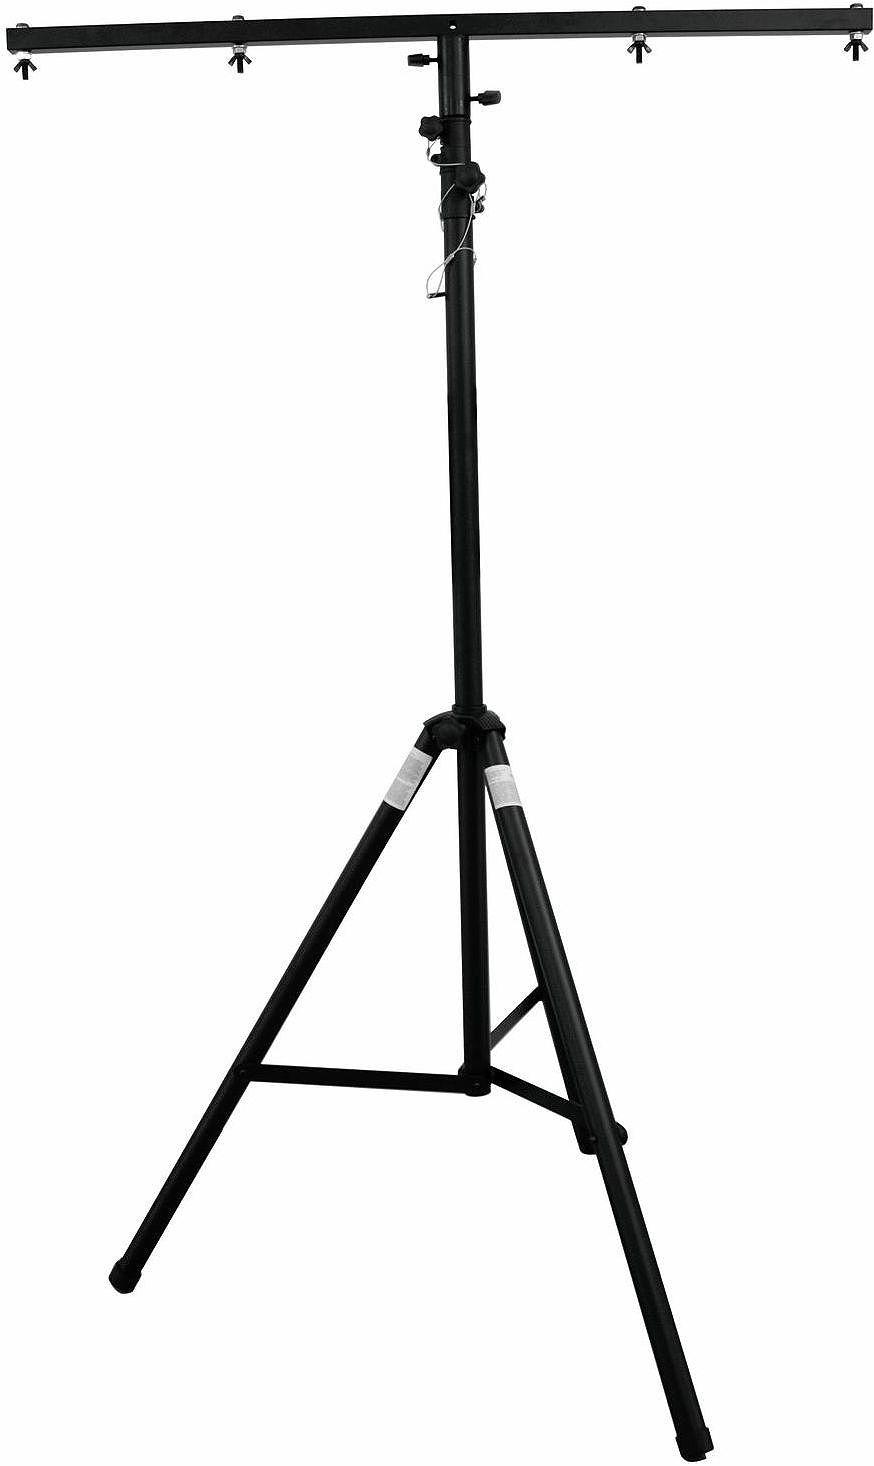 DJ PA Lichtstativ Boxenstativ Licht Stativ Boxen 35 mm 325 cm Scheinwerfer Alu